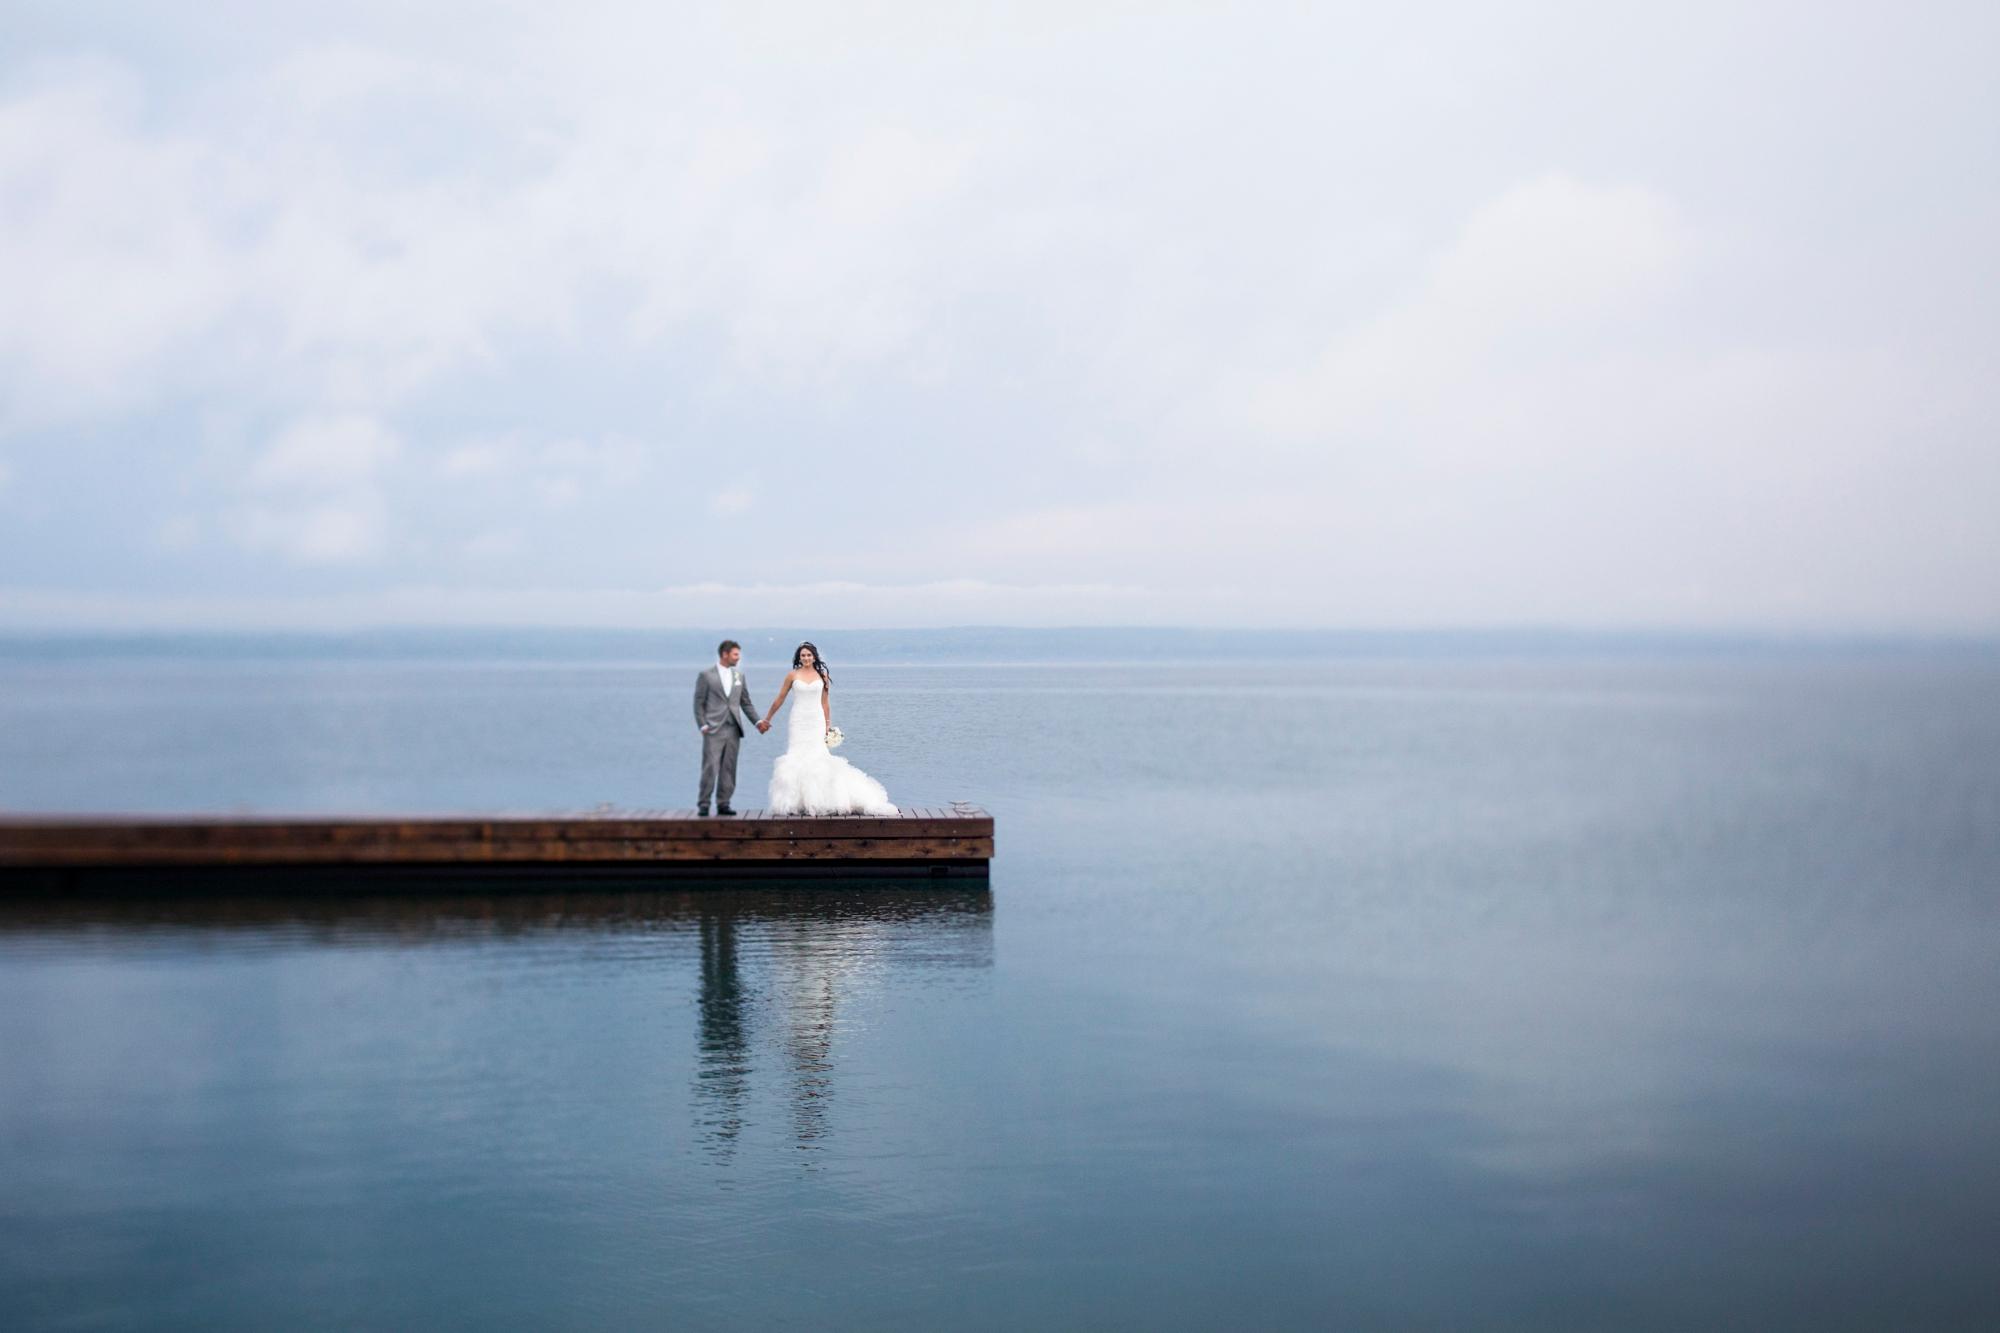 edmonton calgary alberta wedding photographer8.jpg